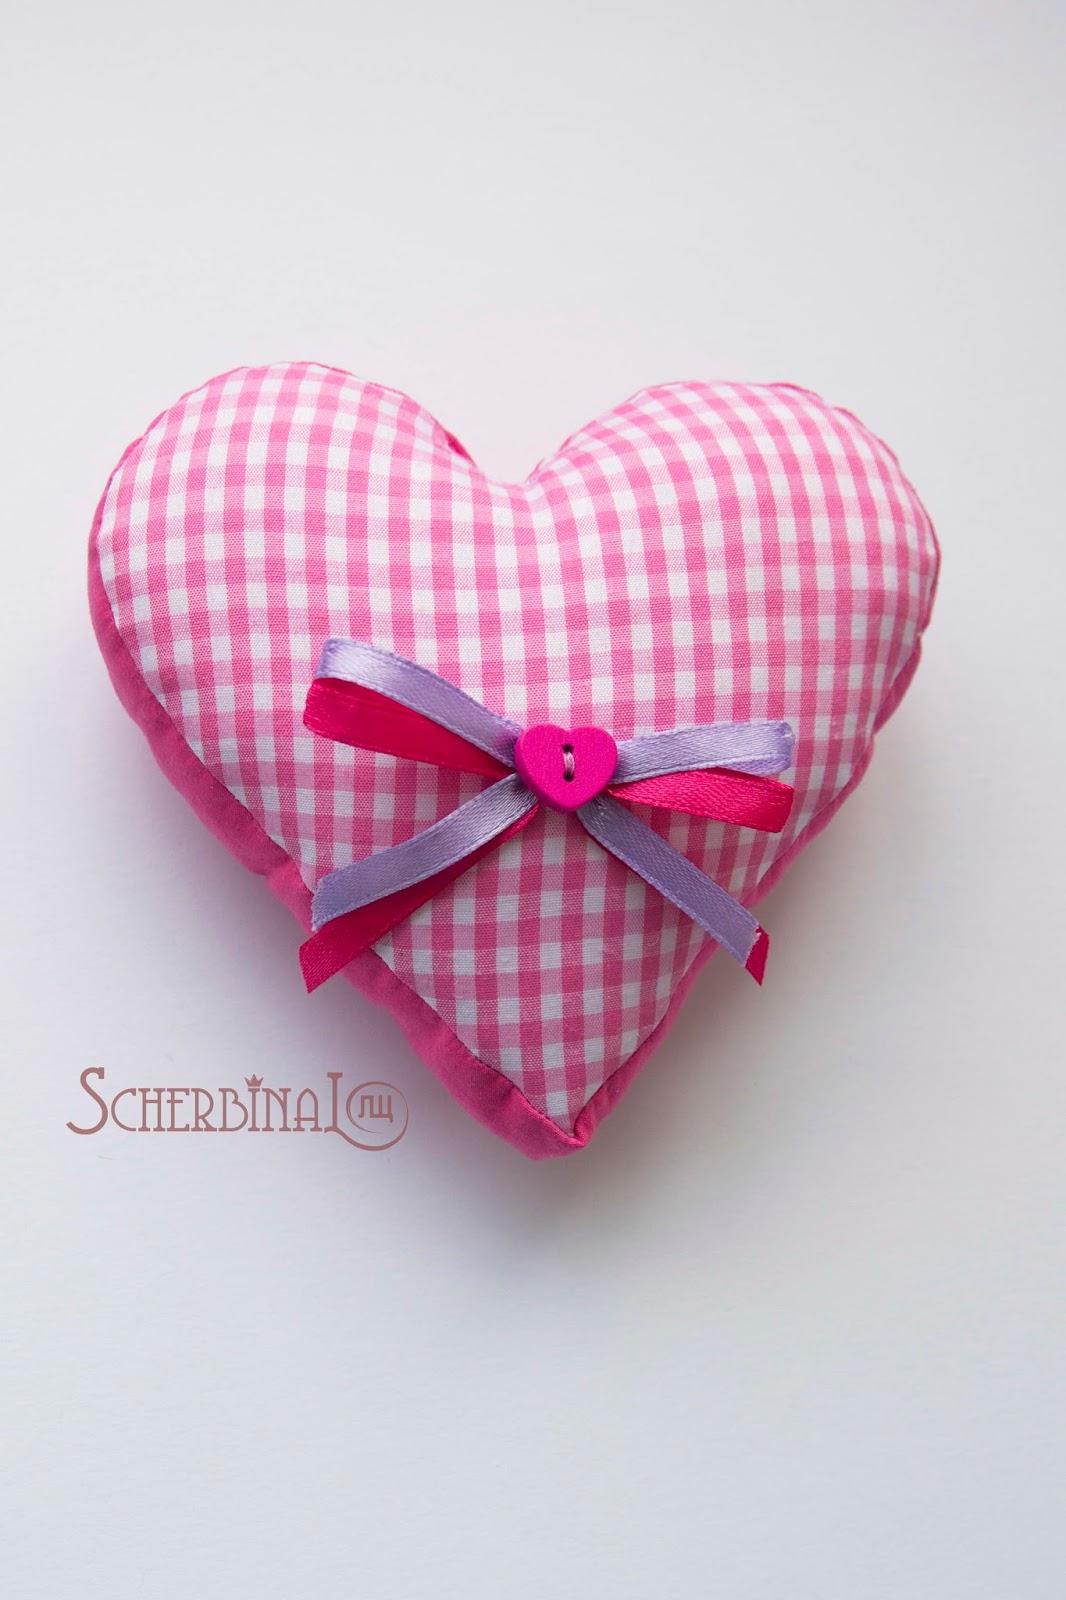 сердце, текстильная подушка